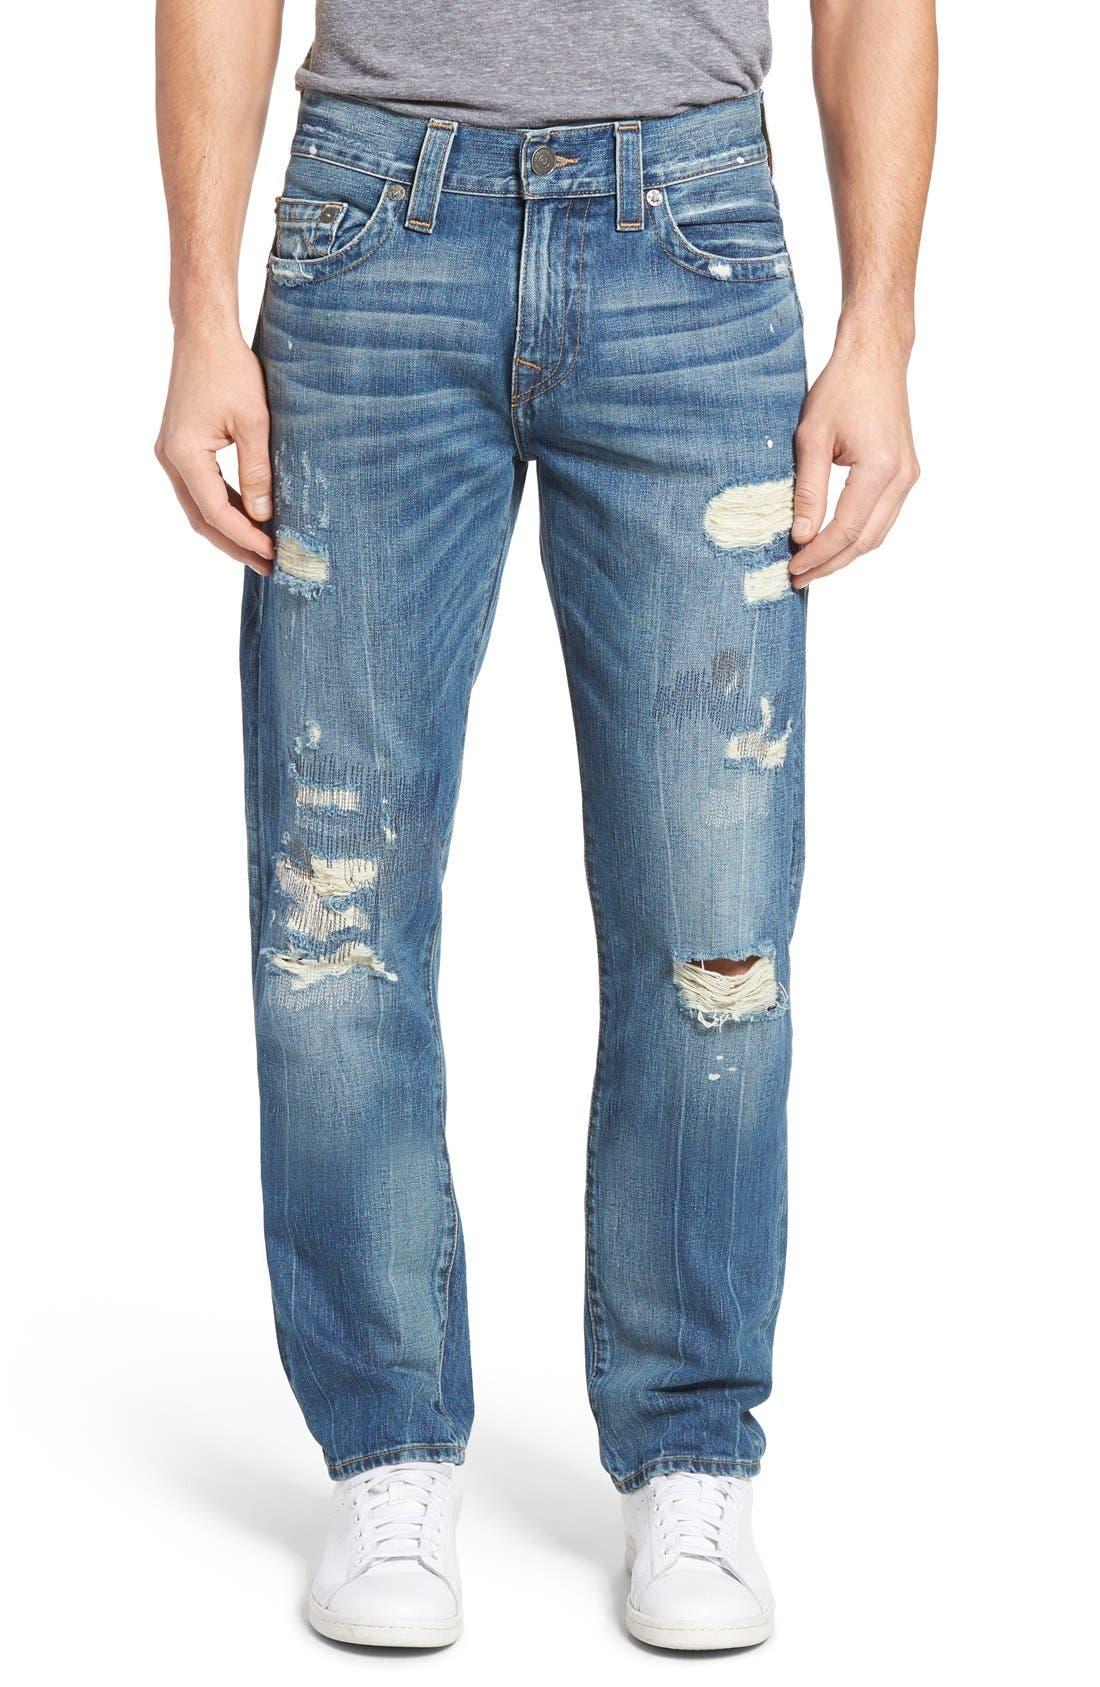 TRUE RELIGION BRAND JEANS Geno Distressed Straight Leg Jeans